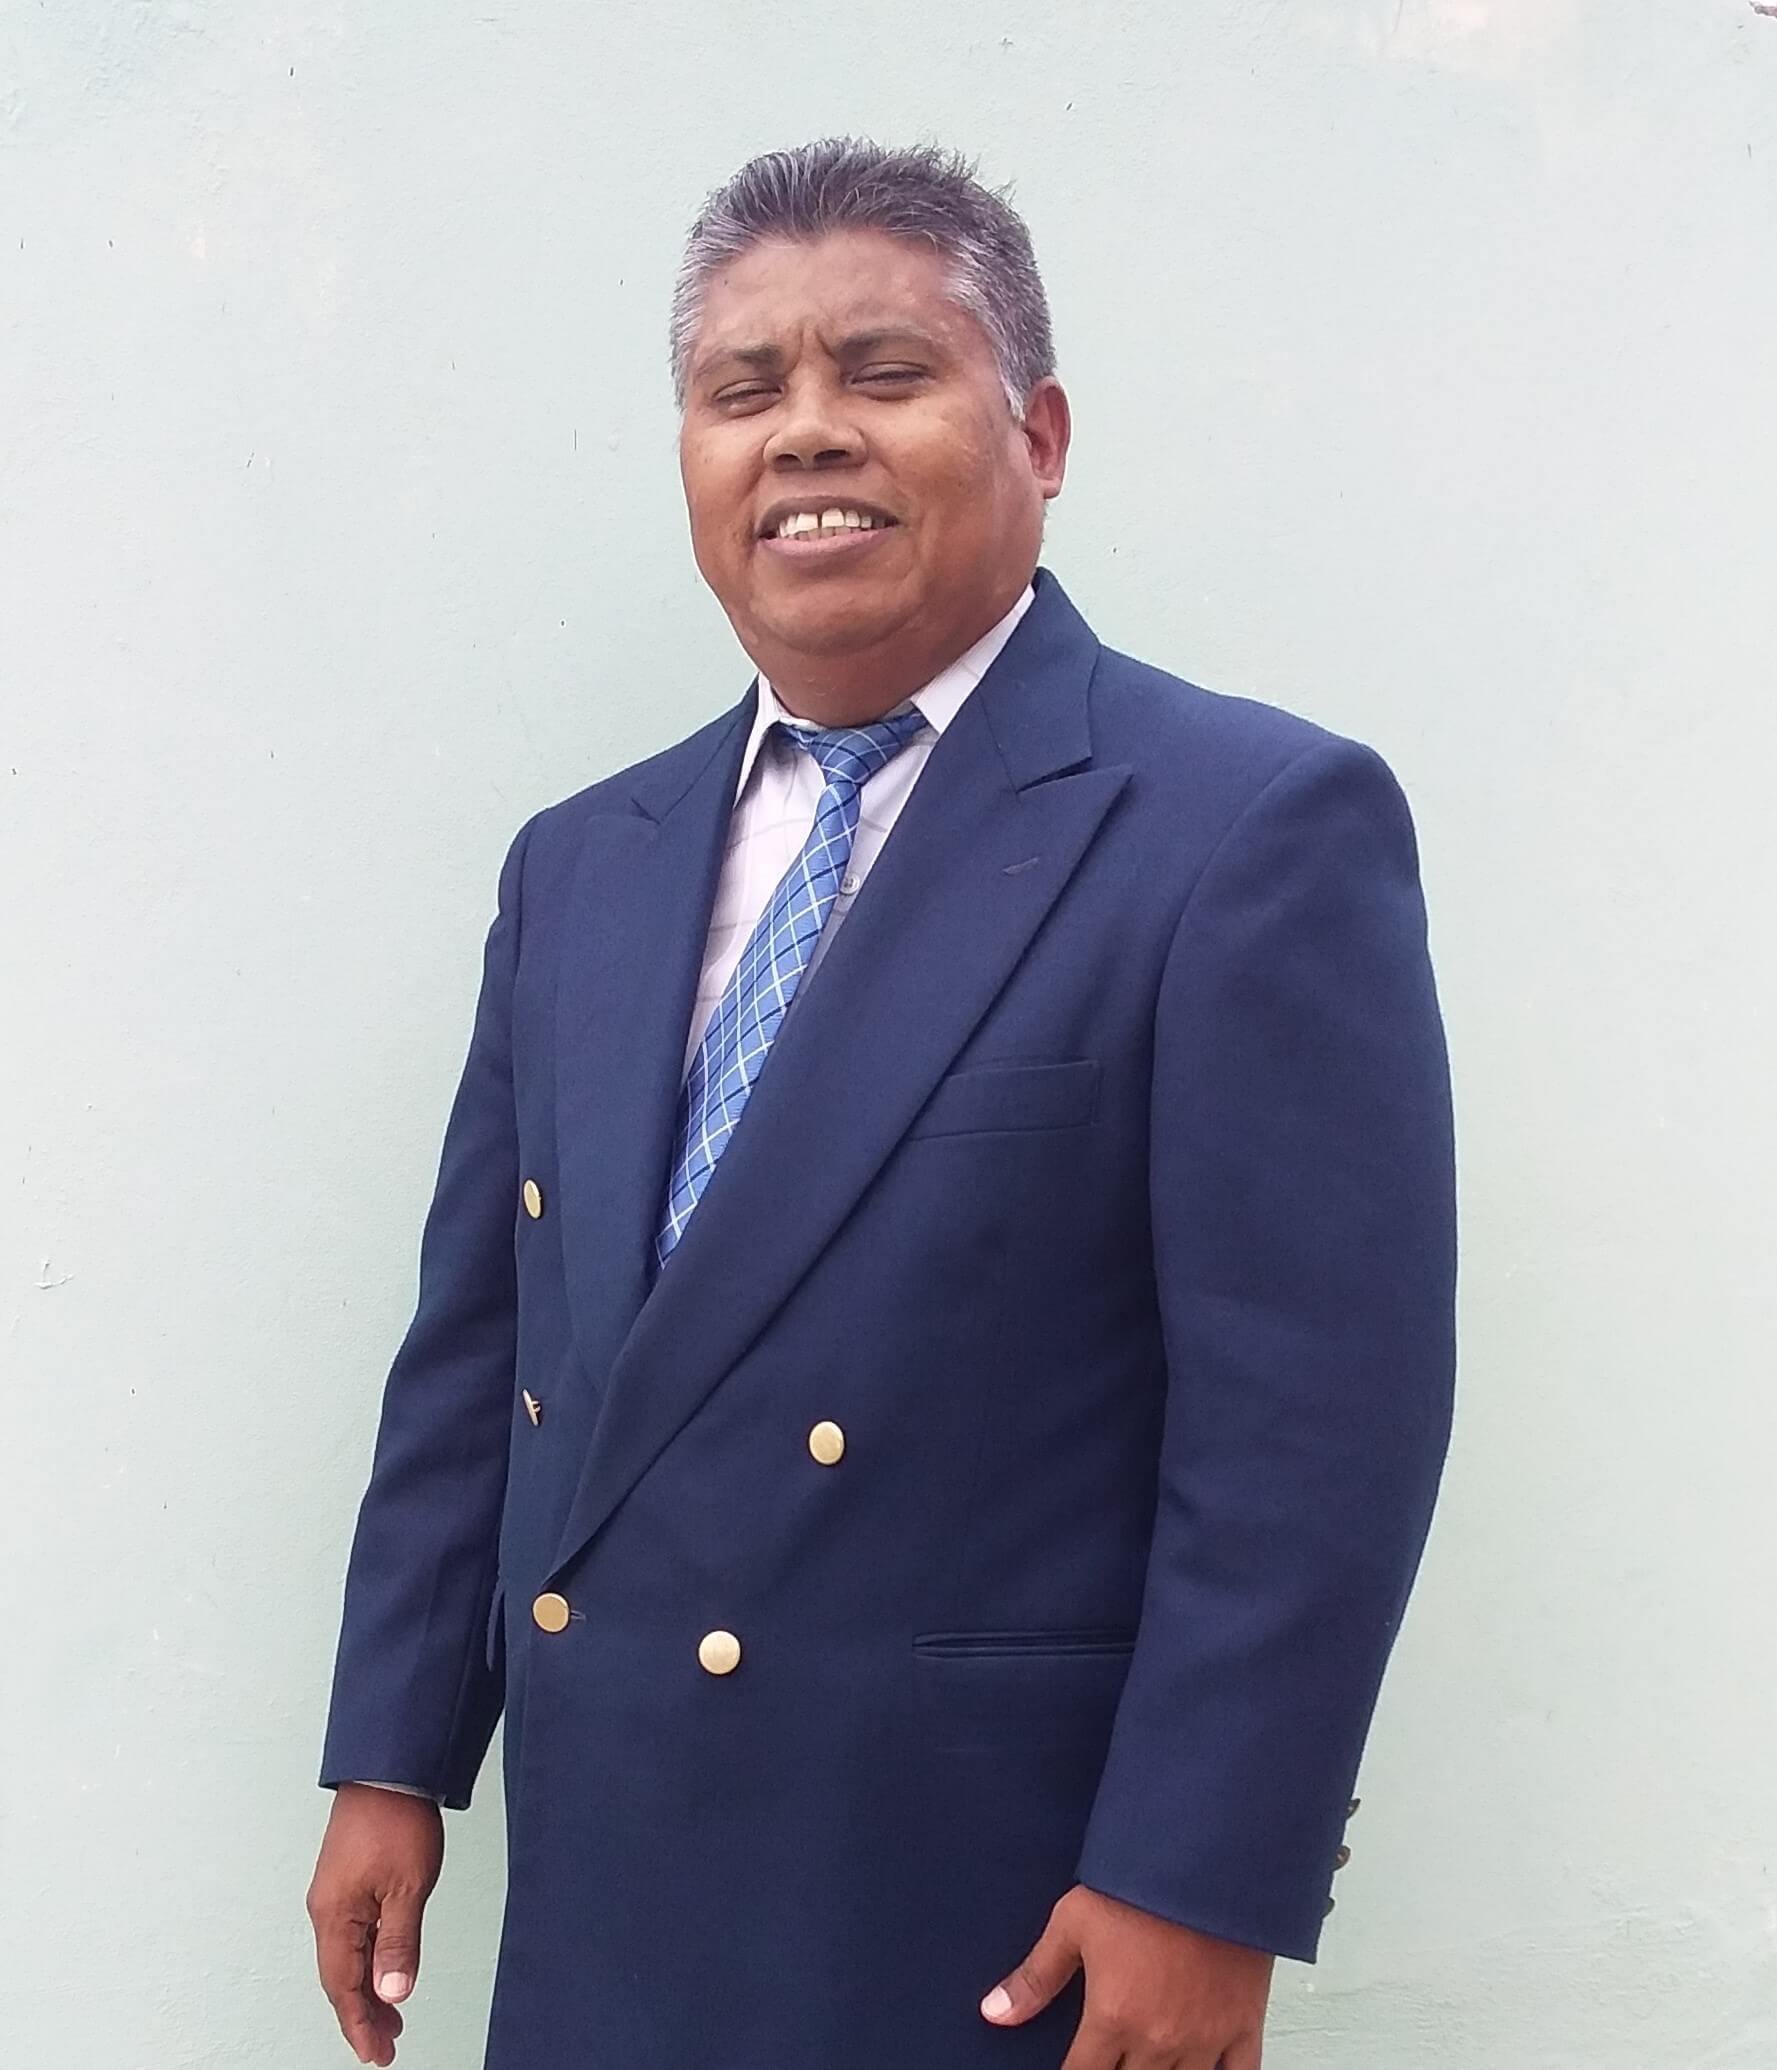 Jose Santamaria